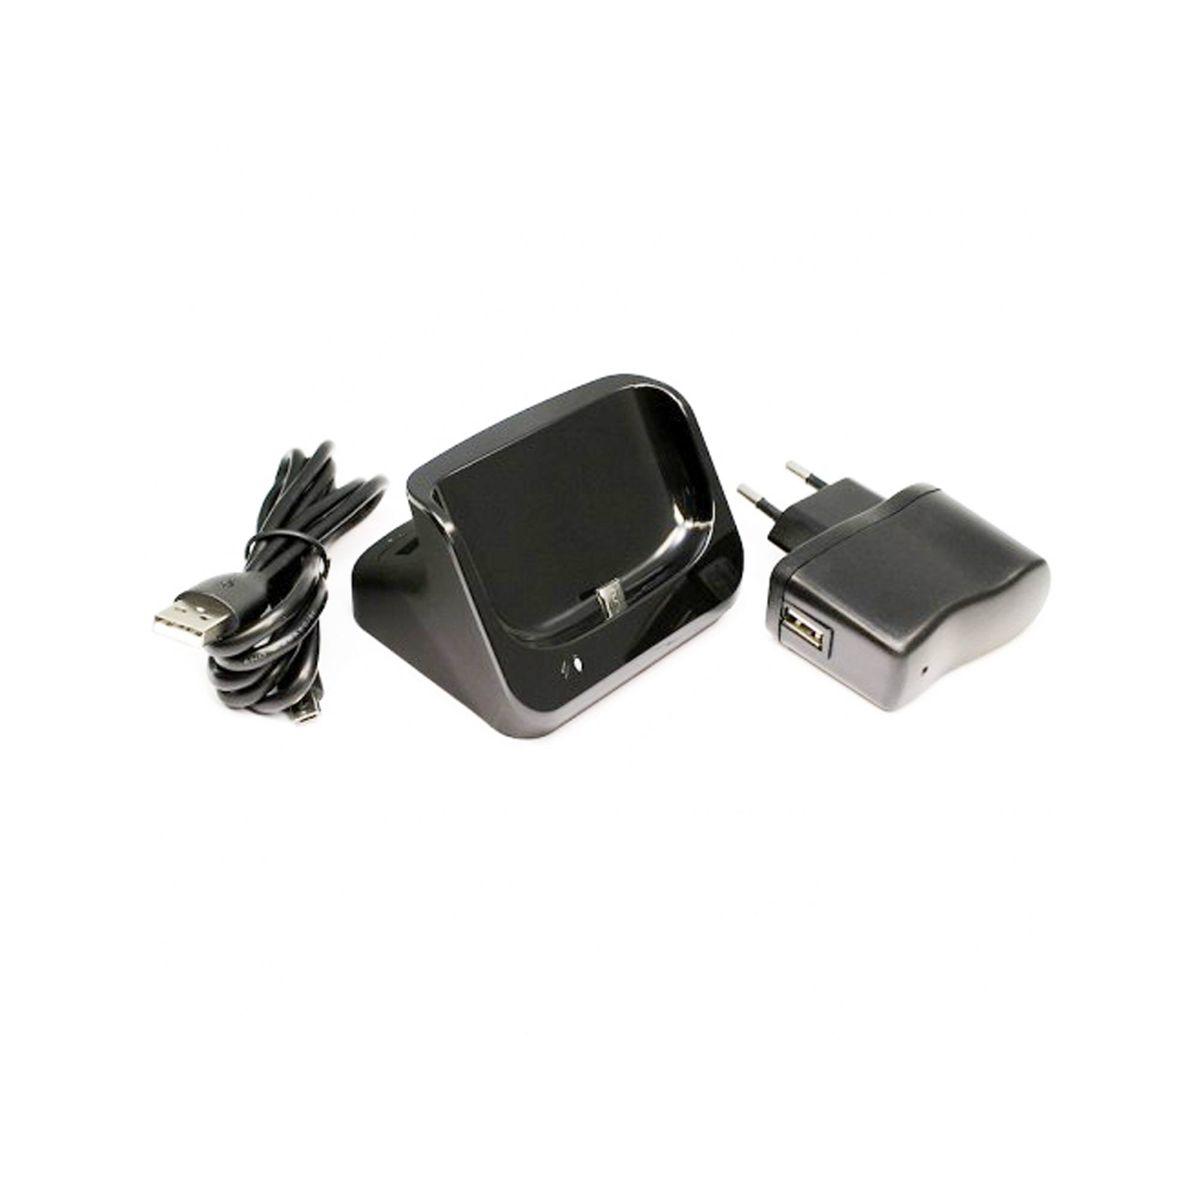 usb dockingstation akku ladeger t f r samsung galaxy s3 gt i9300 i9305 handy smartphone. Black Bedroom Furniture Sets. Home Design Ideas